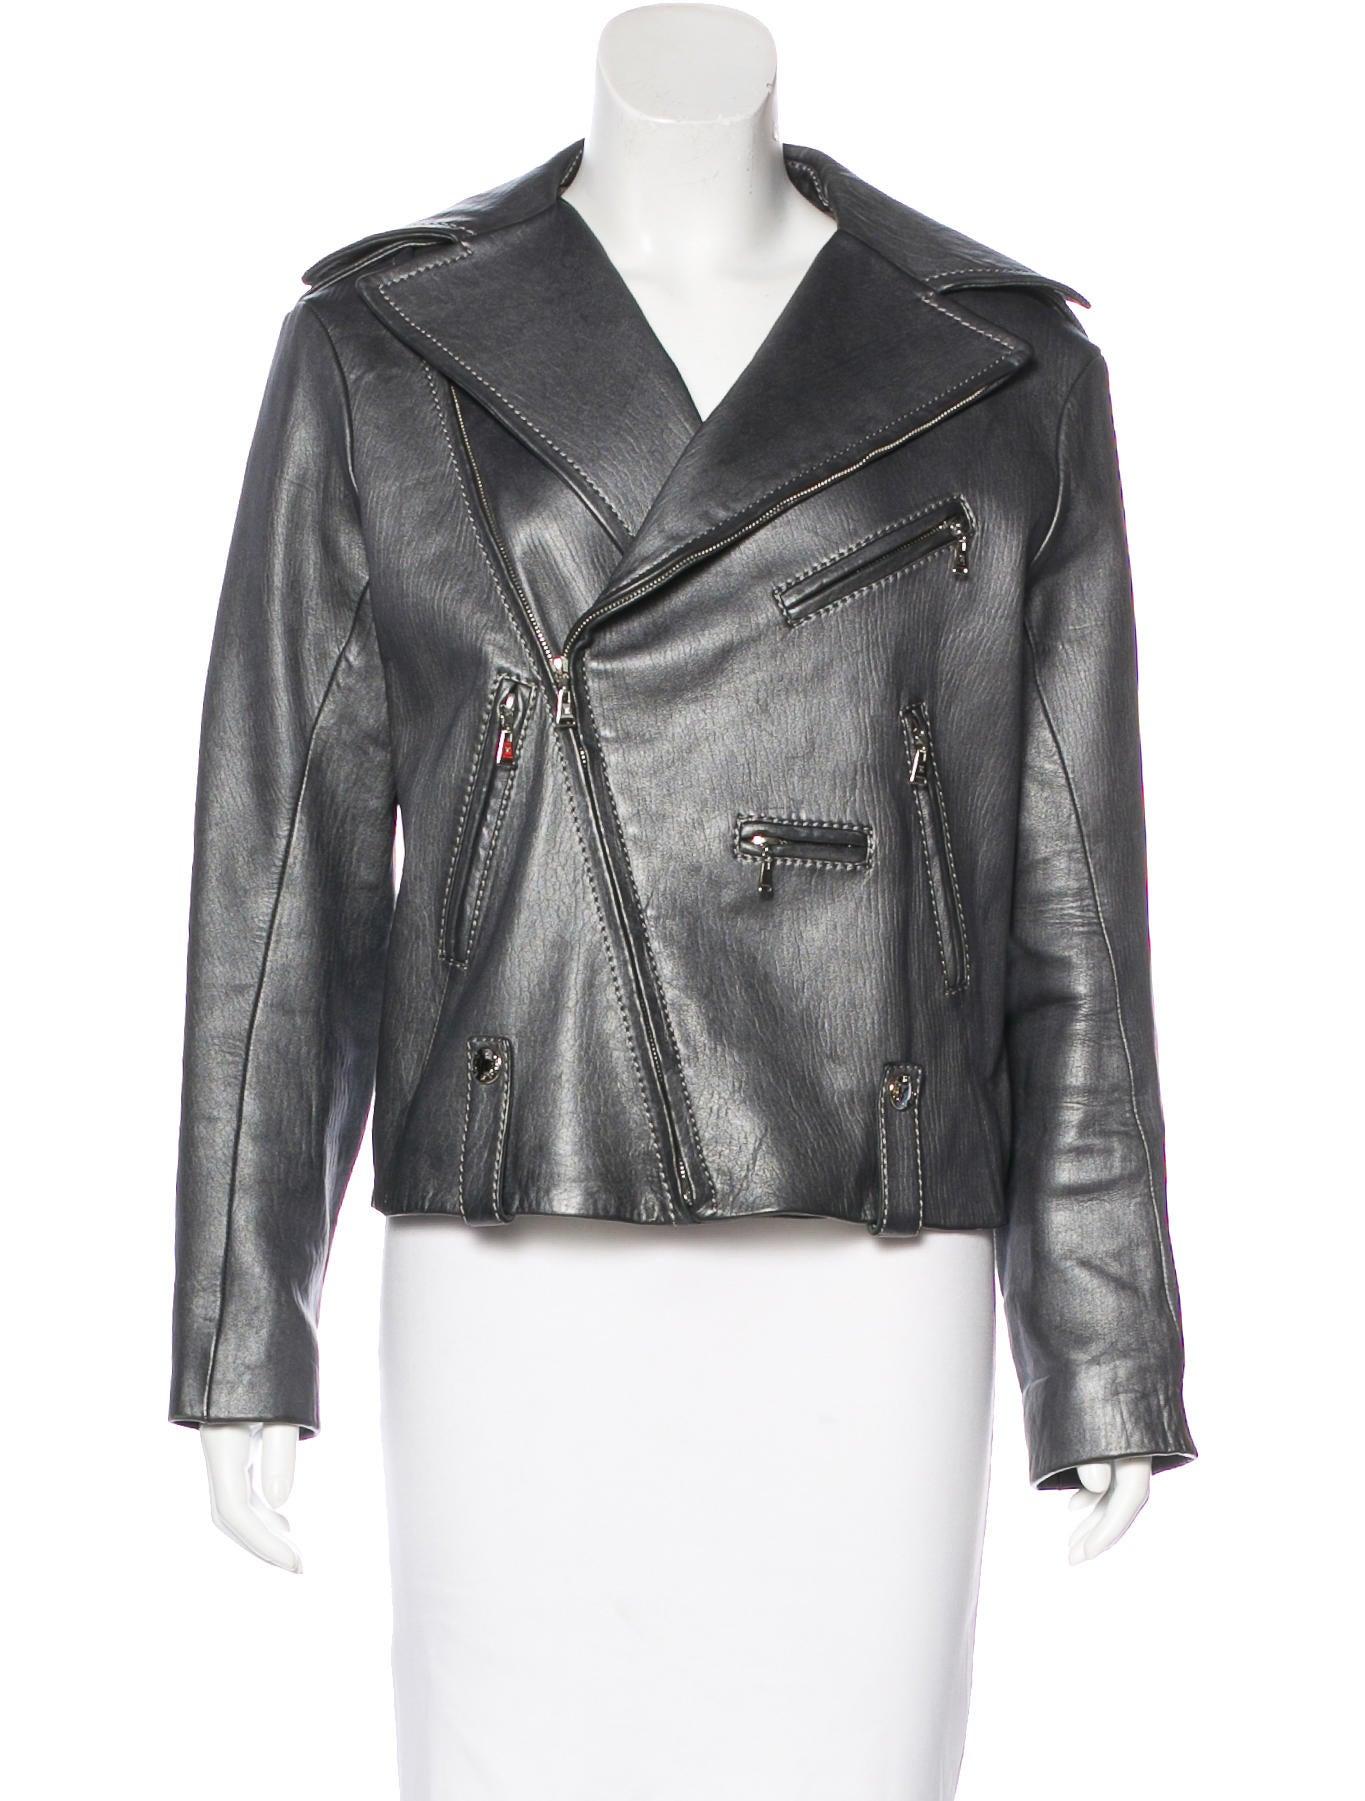 Louis vuitton leather jacket